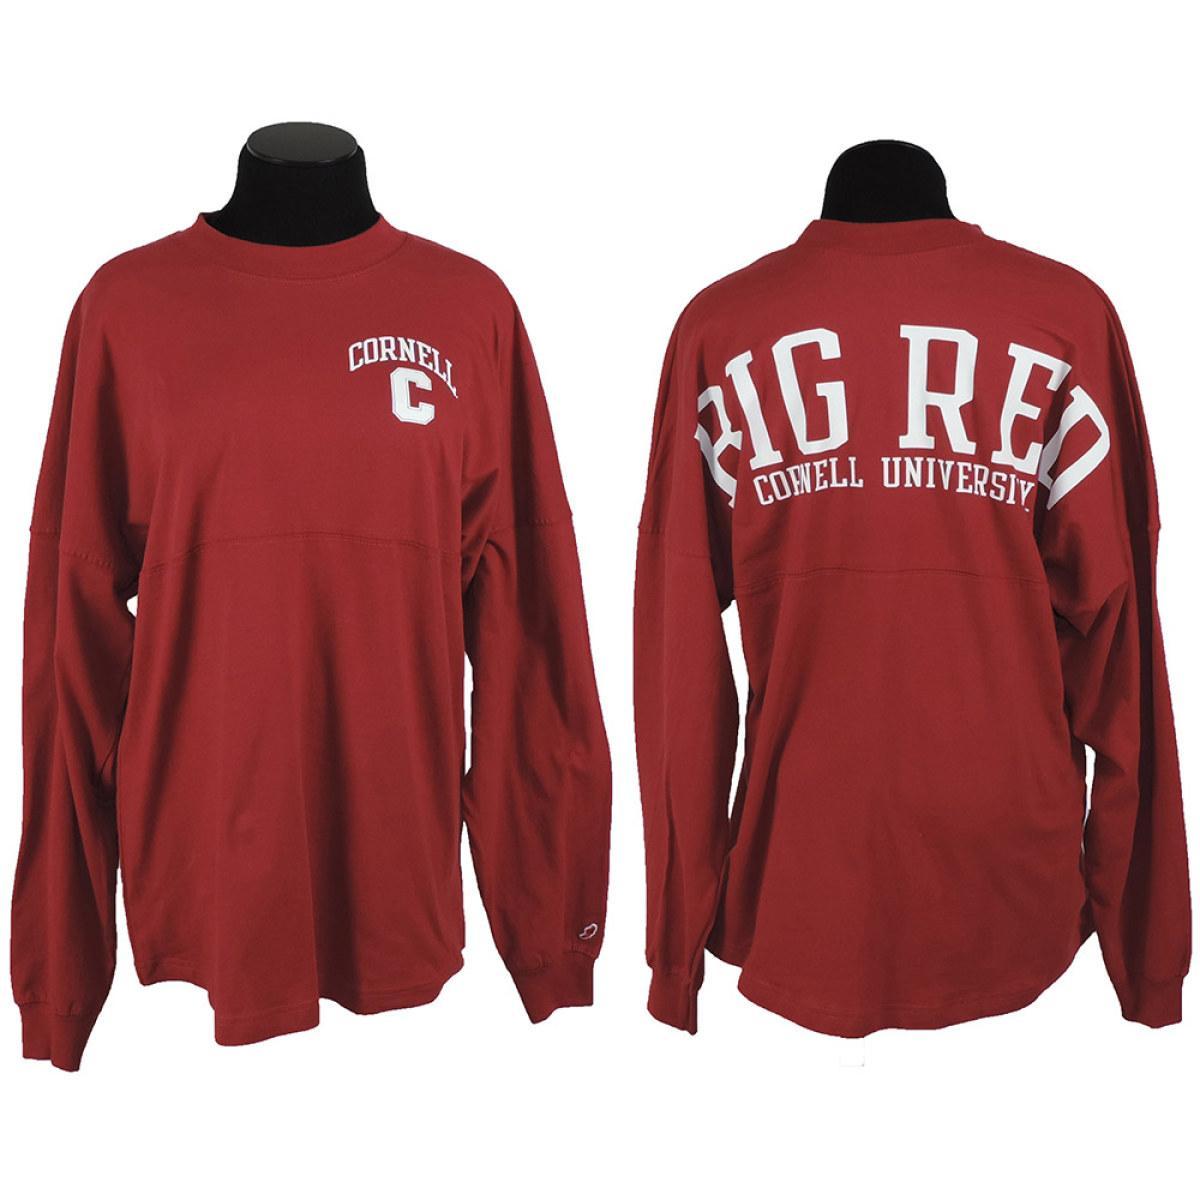 31519f36dafb Women s Long Sleeve Tee Ra Ra Big Red - Red